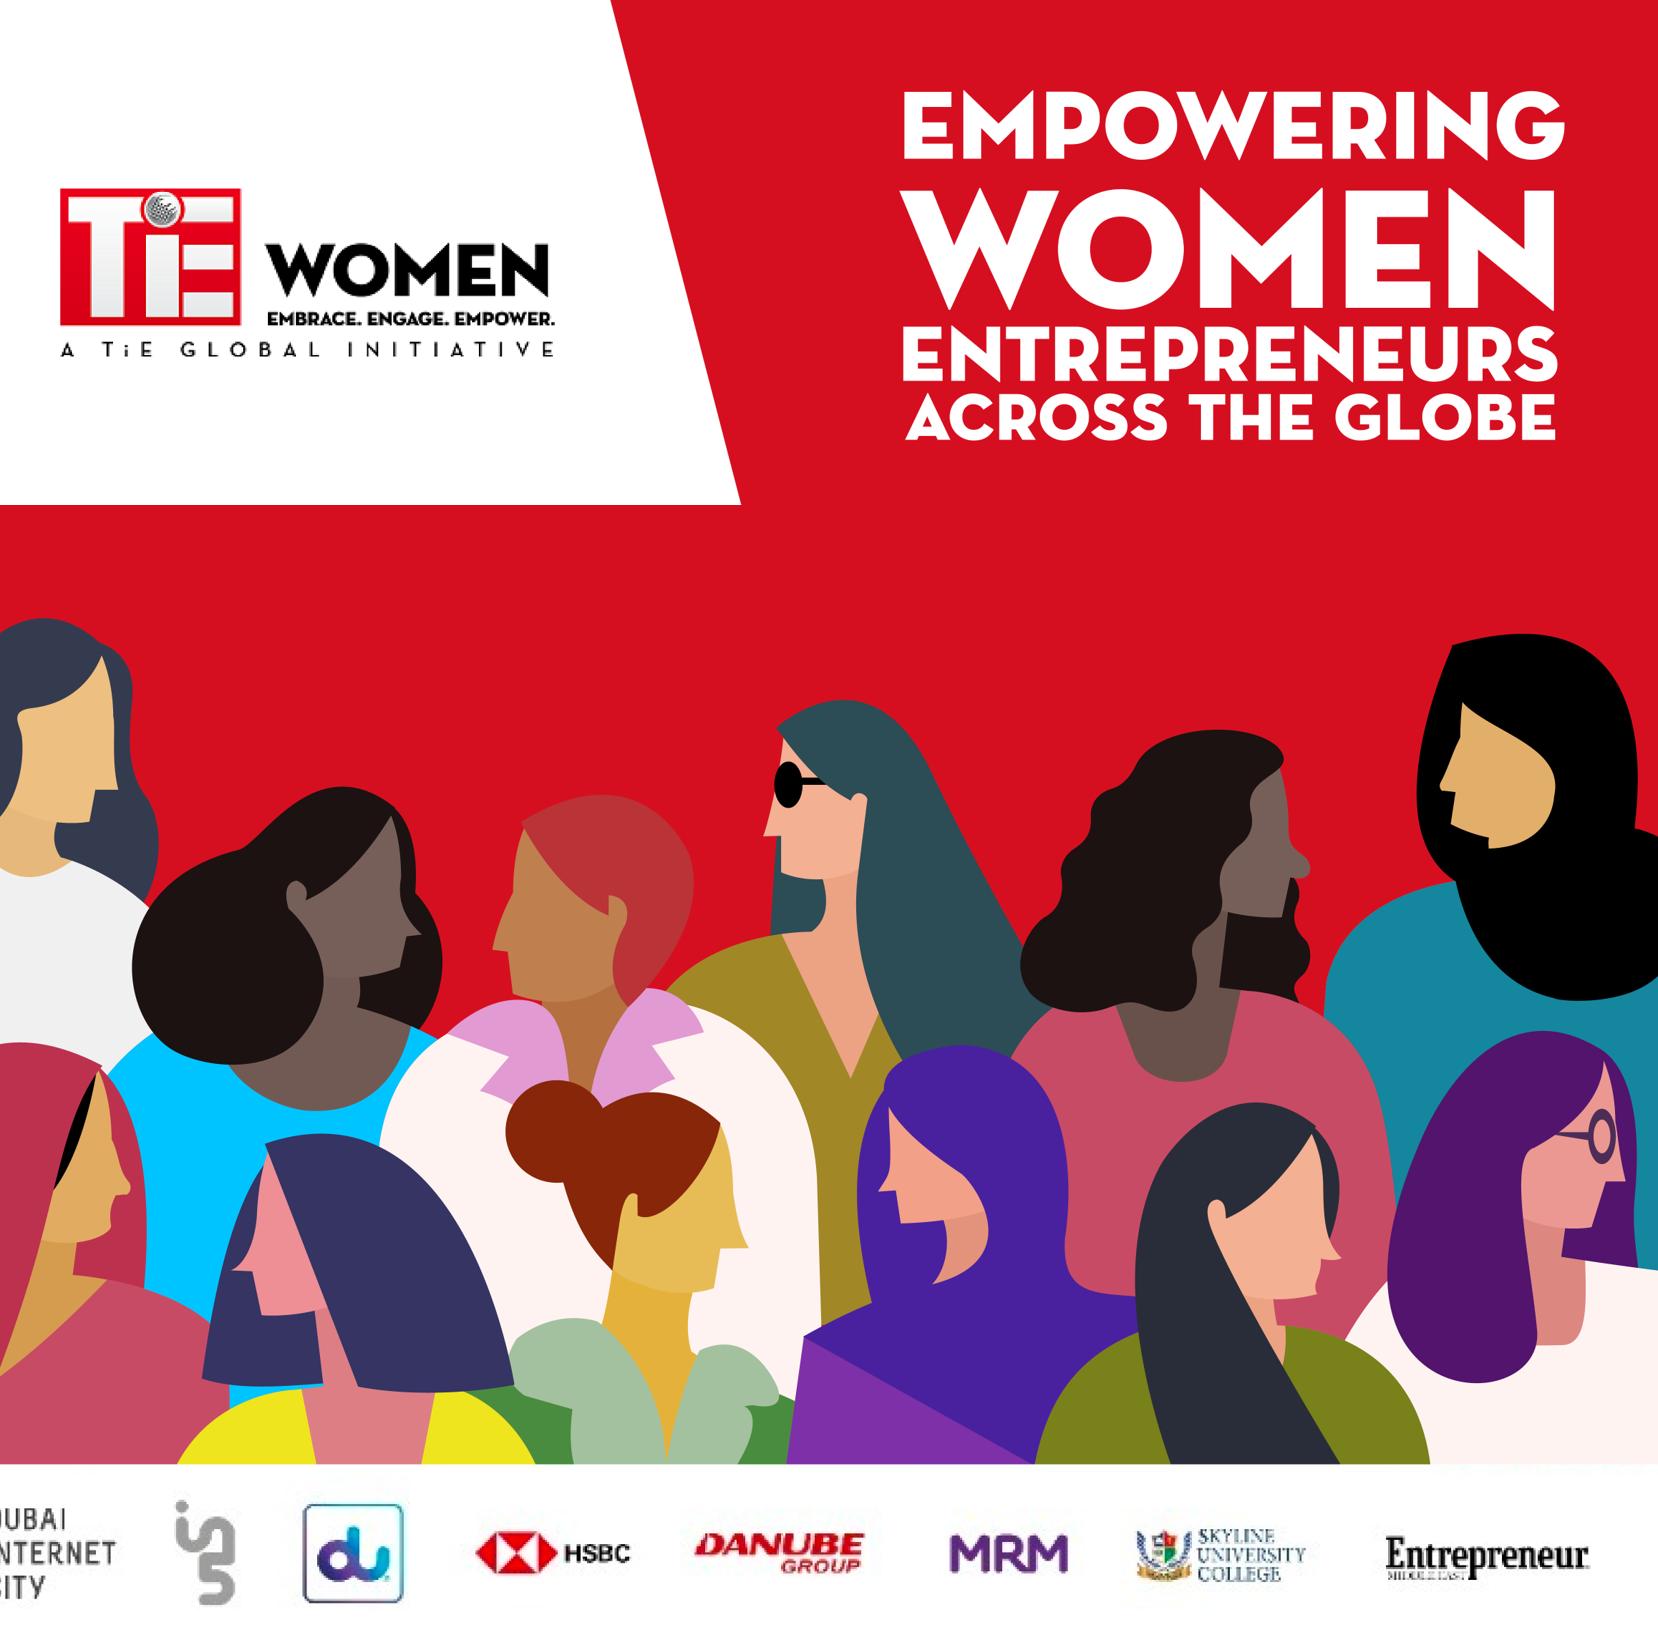 TiE Dubai offers $100,000 to winning startup